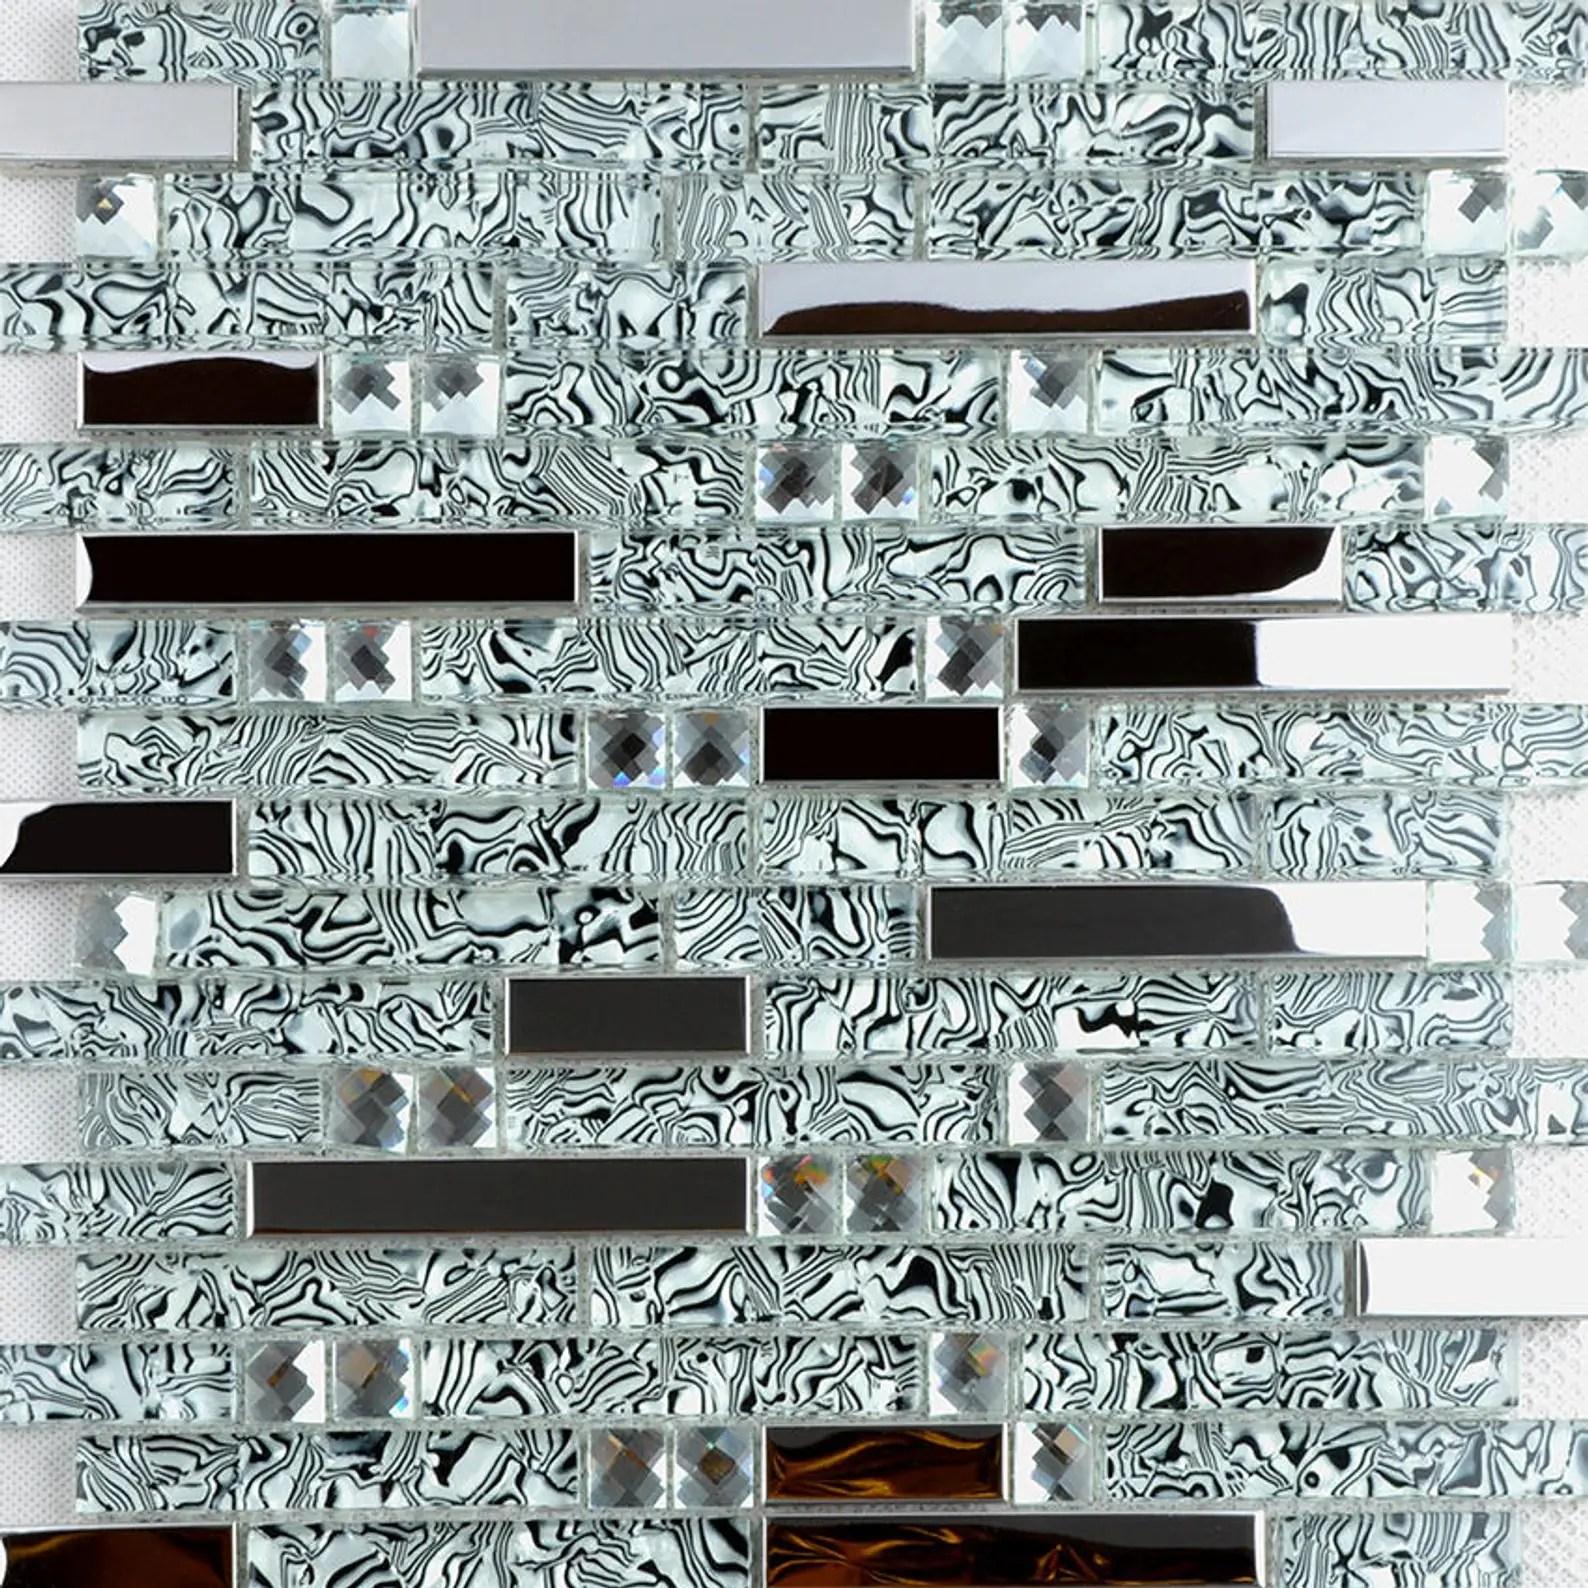 black white glass mosaic silver metal kitchen tile backsplash silver stainless steel glass tiles ssmt397 glass mosaic bathroom tile